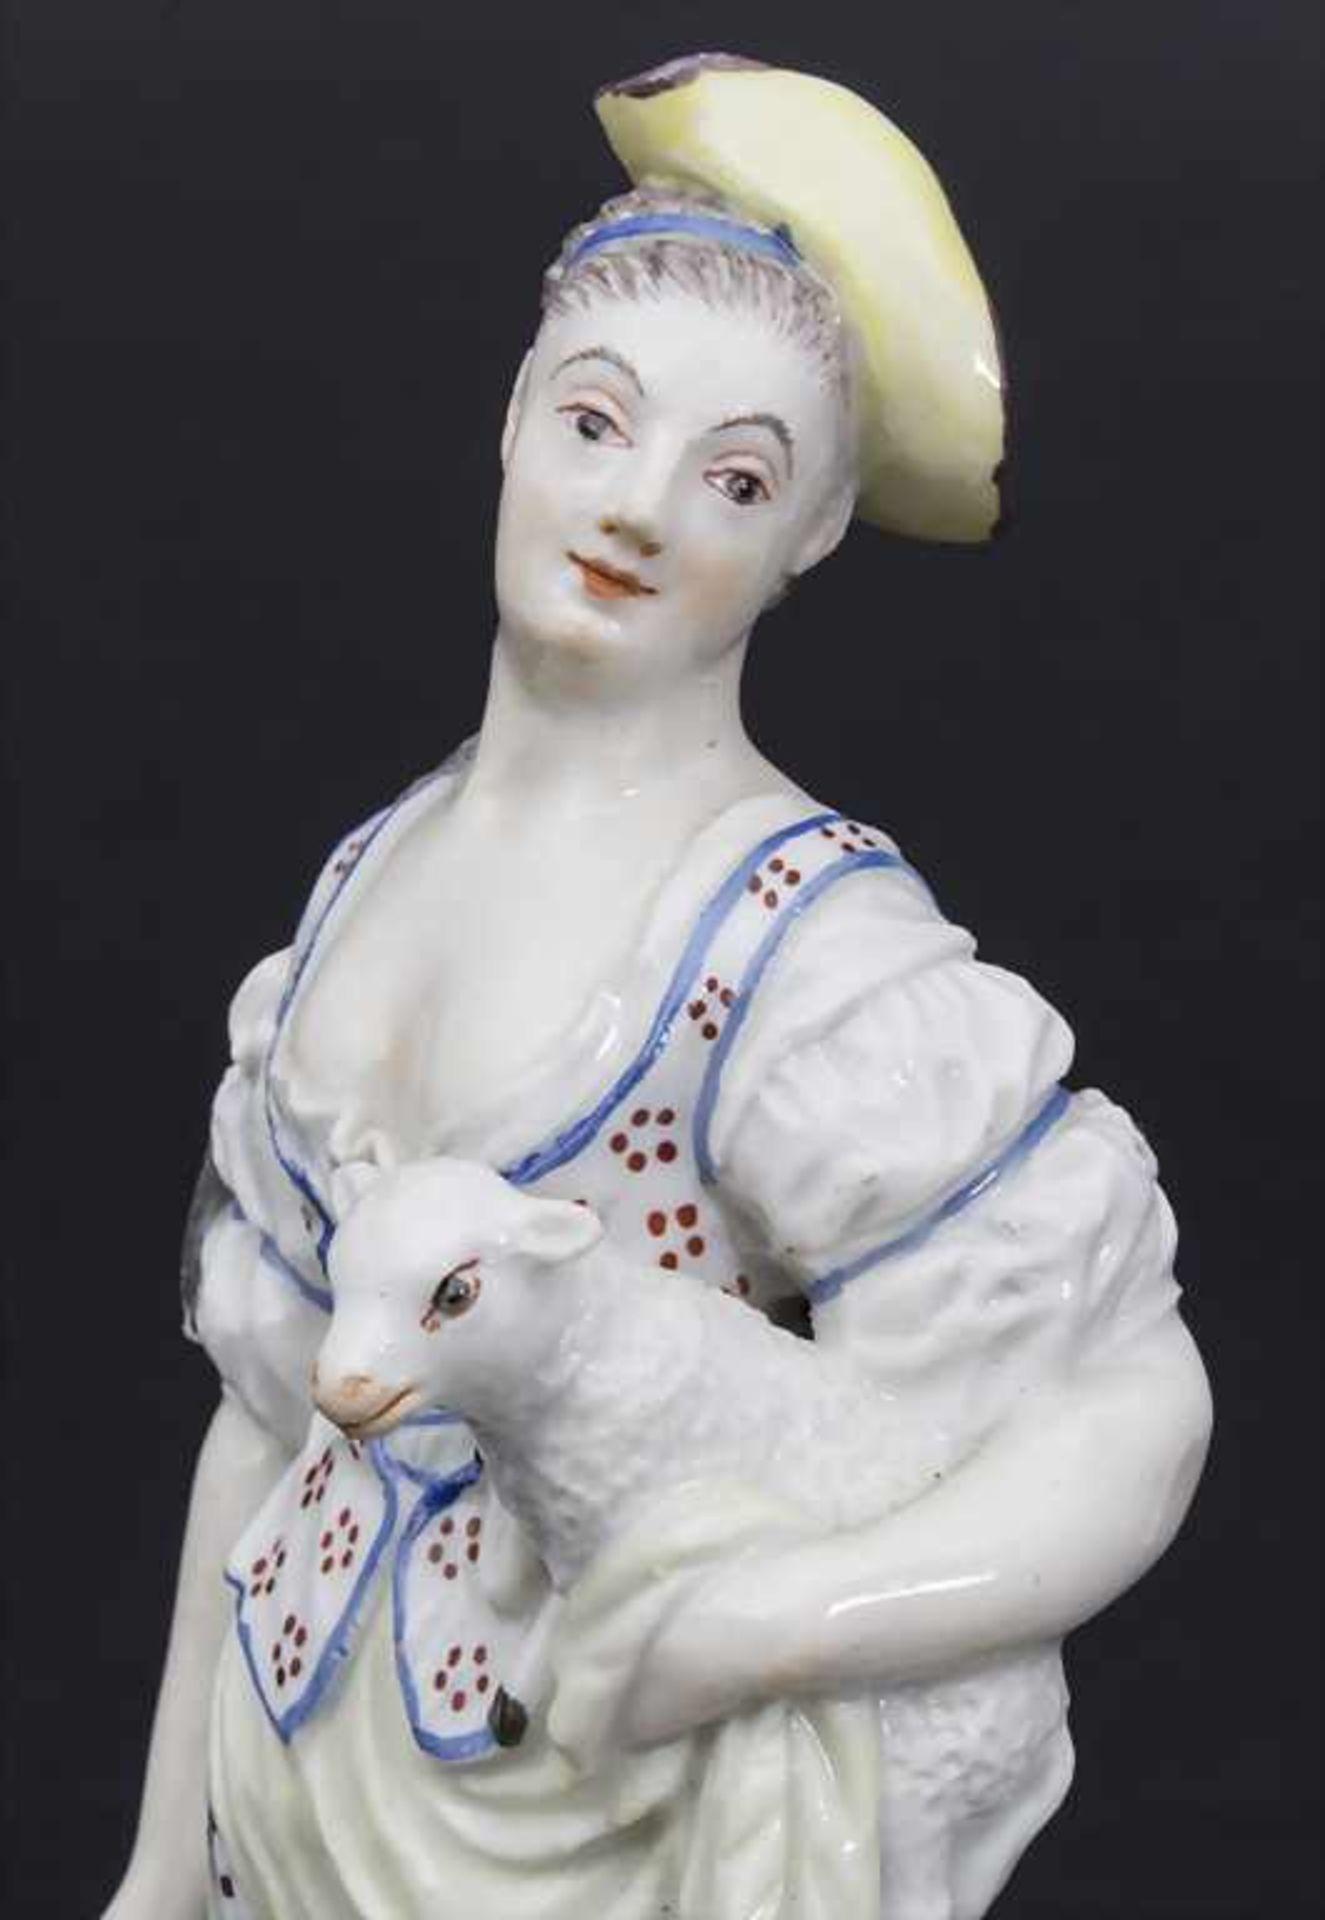 Schäferin mit Lamm / A shepherdess holding a lamb, wohl Joseph Nees, Ludwigsburg, 1760-67 - Bild 6 aus 8